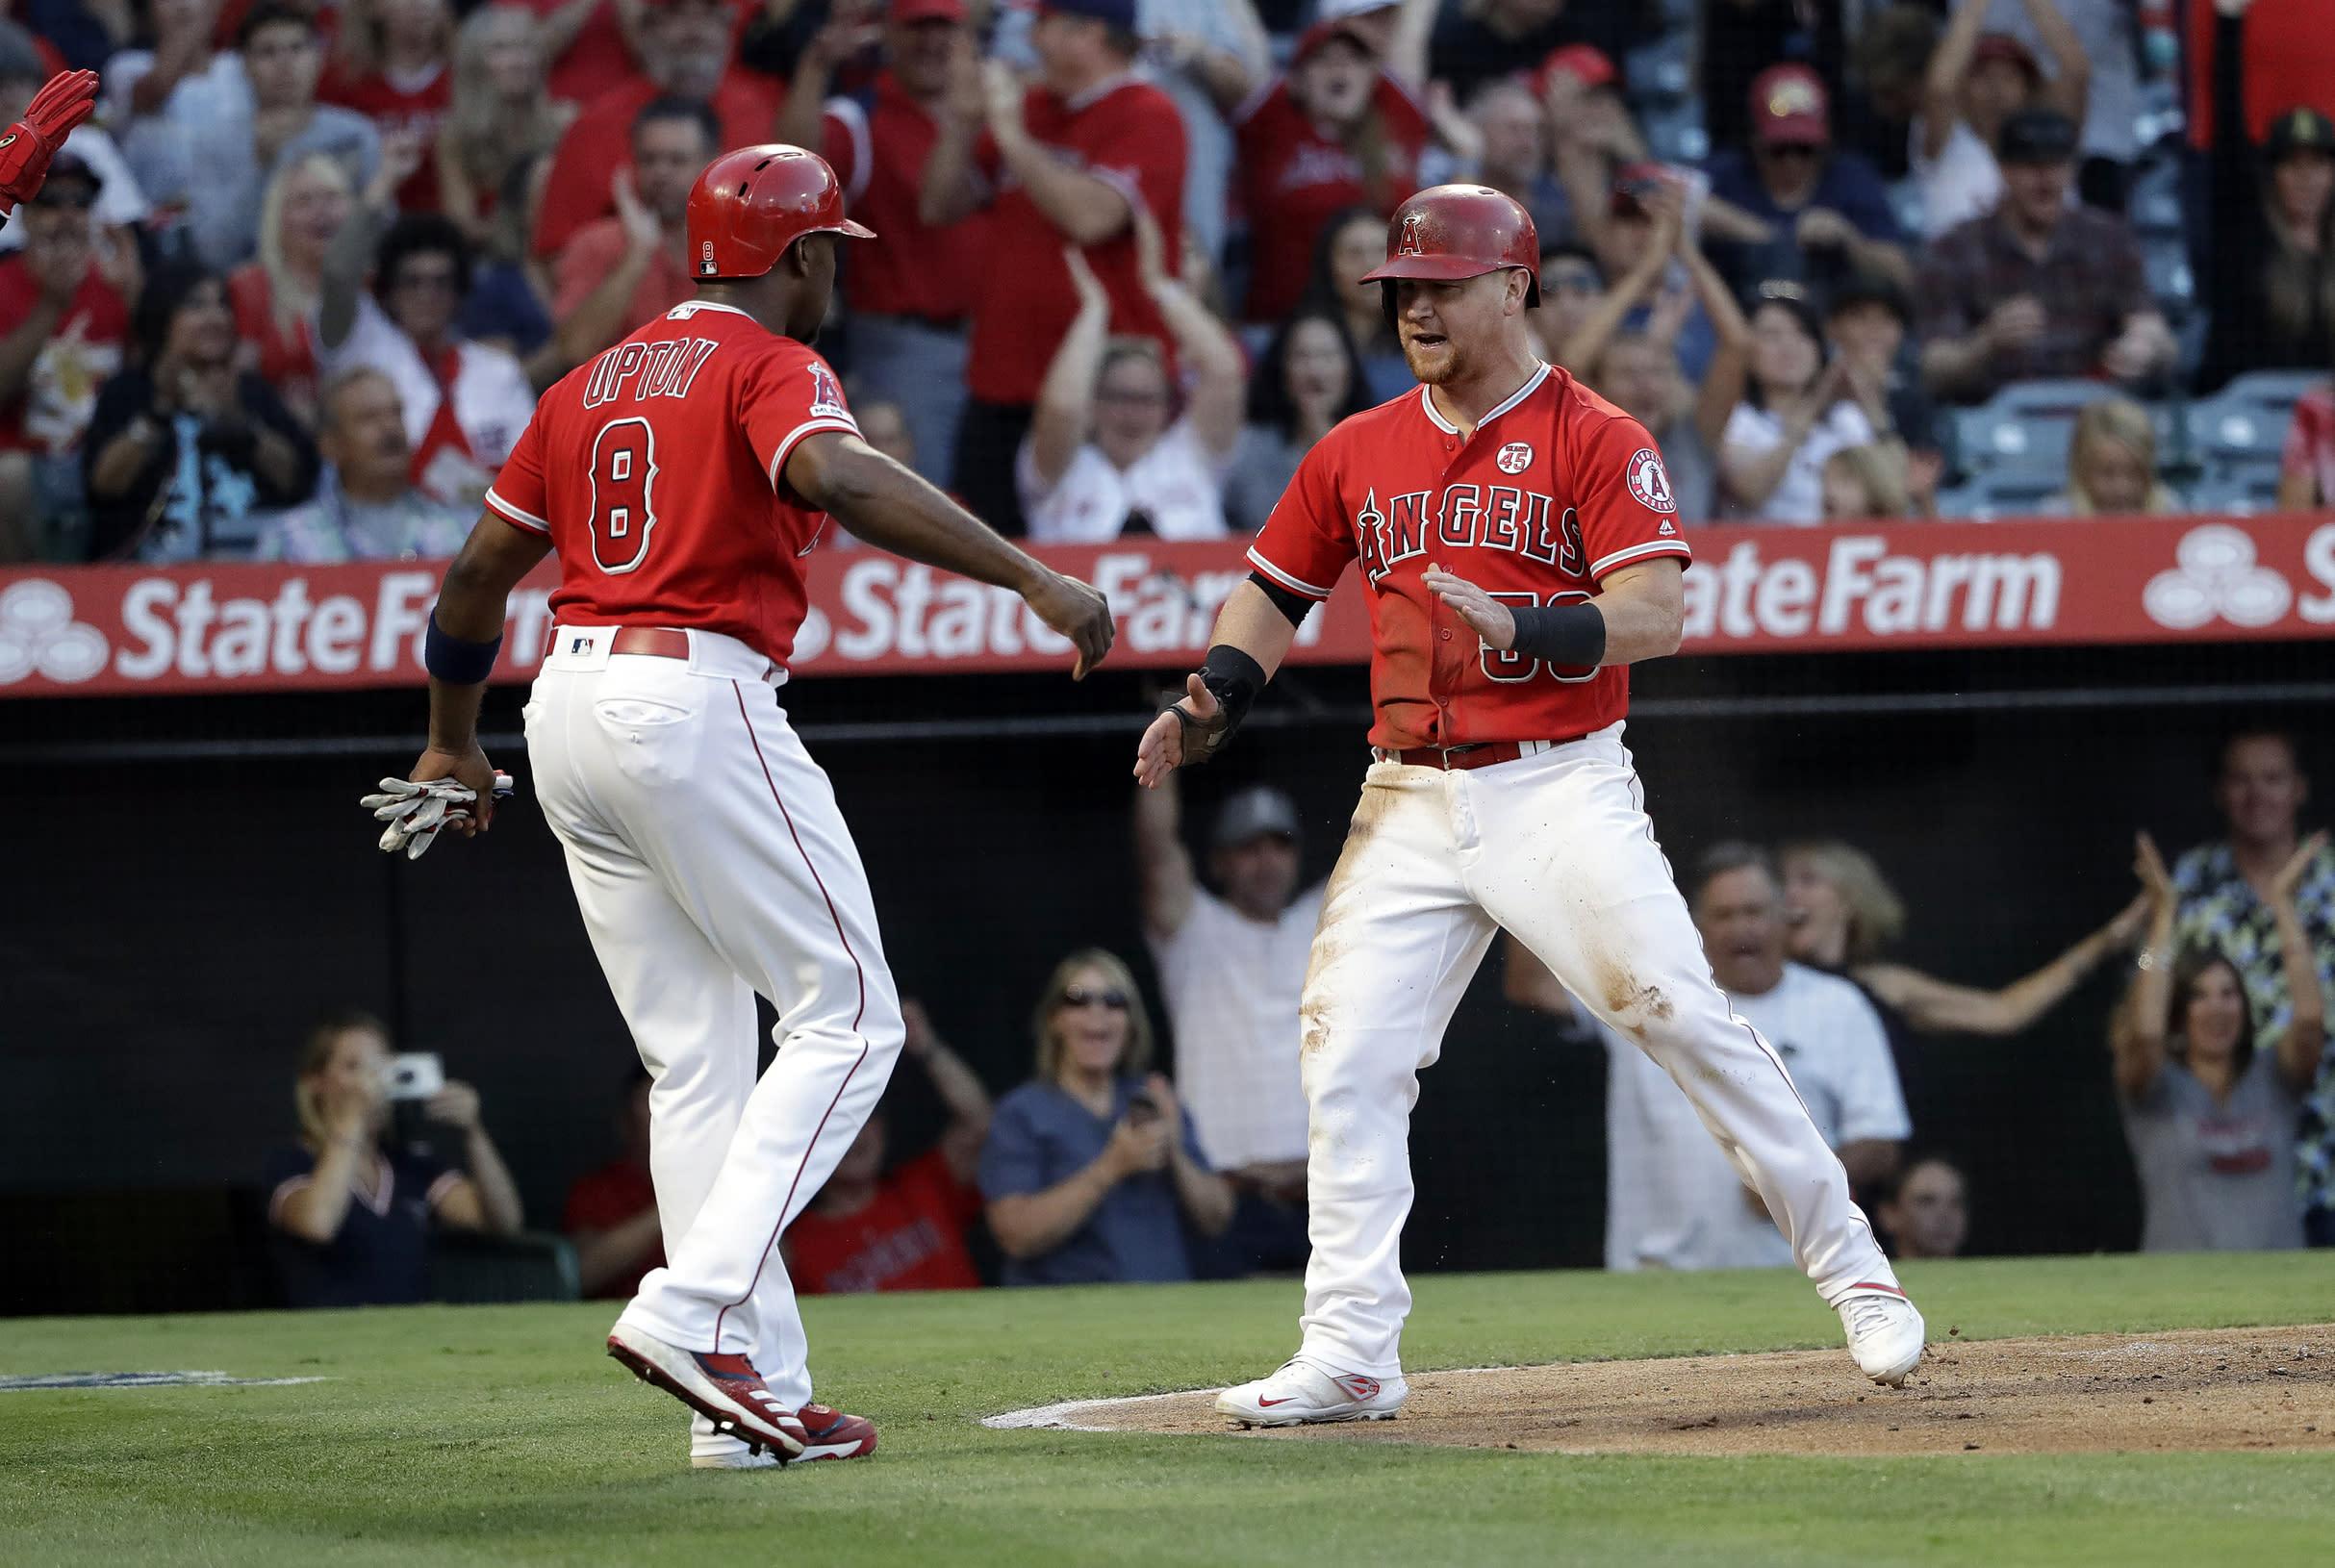 Angels' Ramirez, Ausmus suspended after Astros' Marisnick hit by pitch